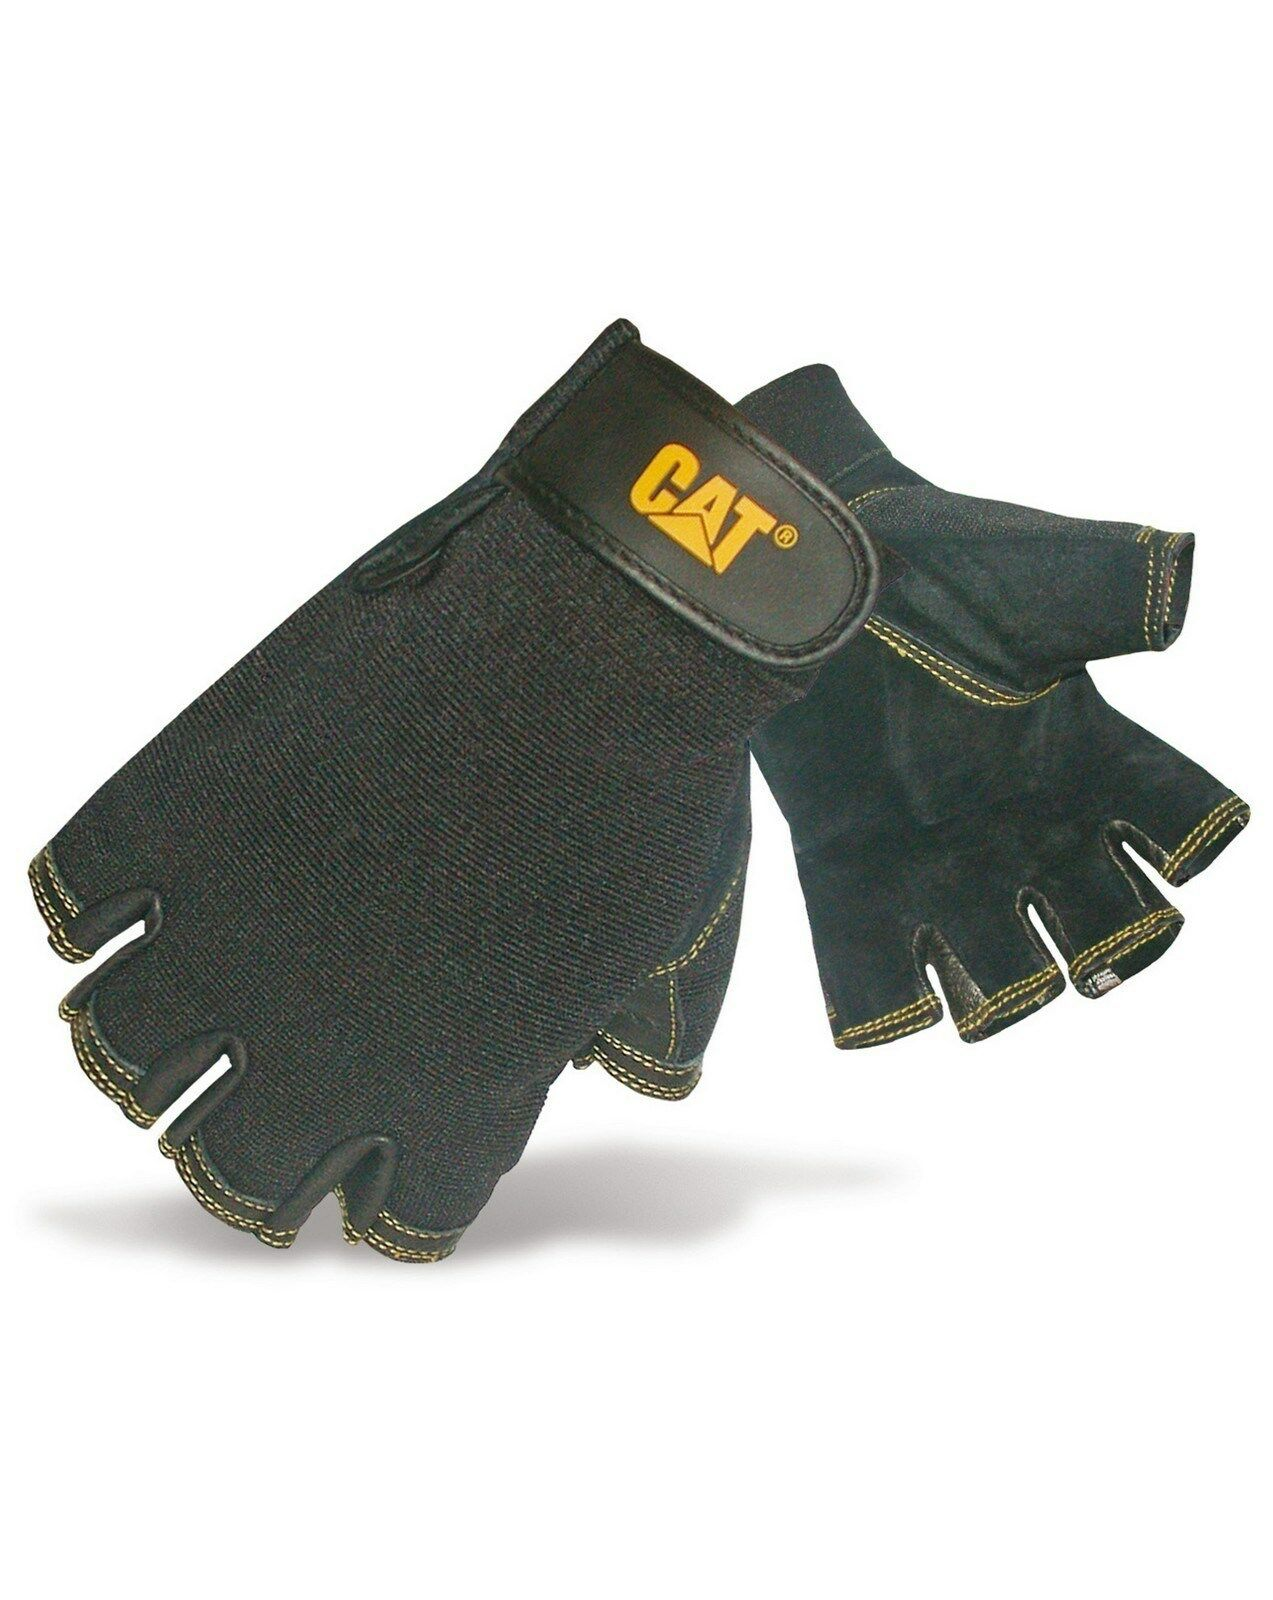 CAT Caterpillar Adjustable Gloves Mens Water Resistant Durable Work